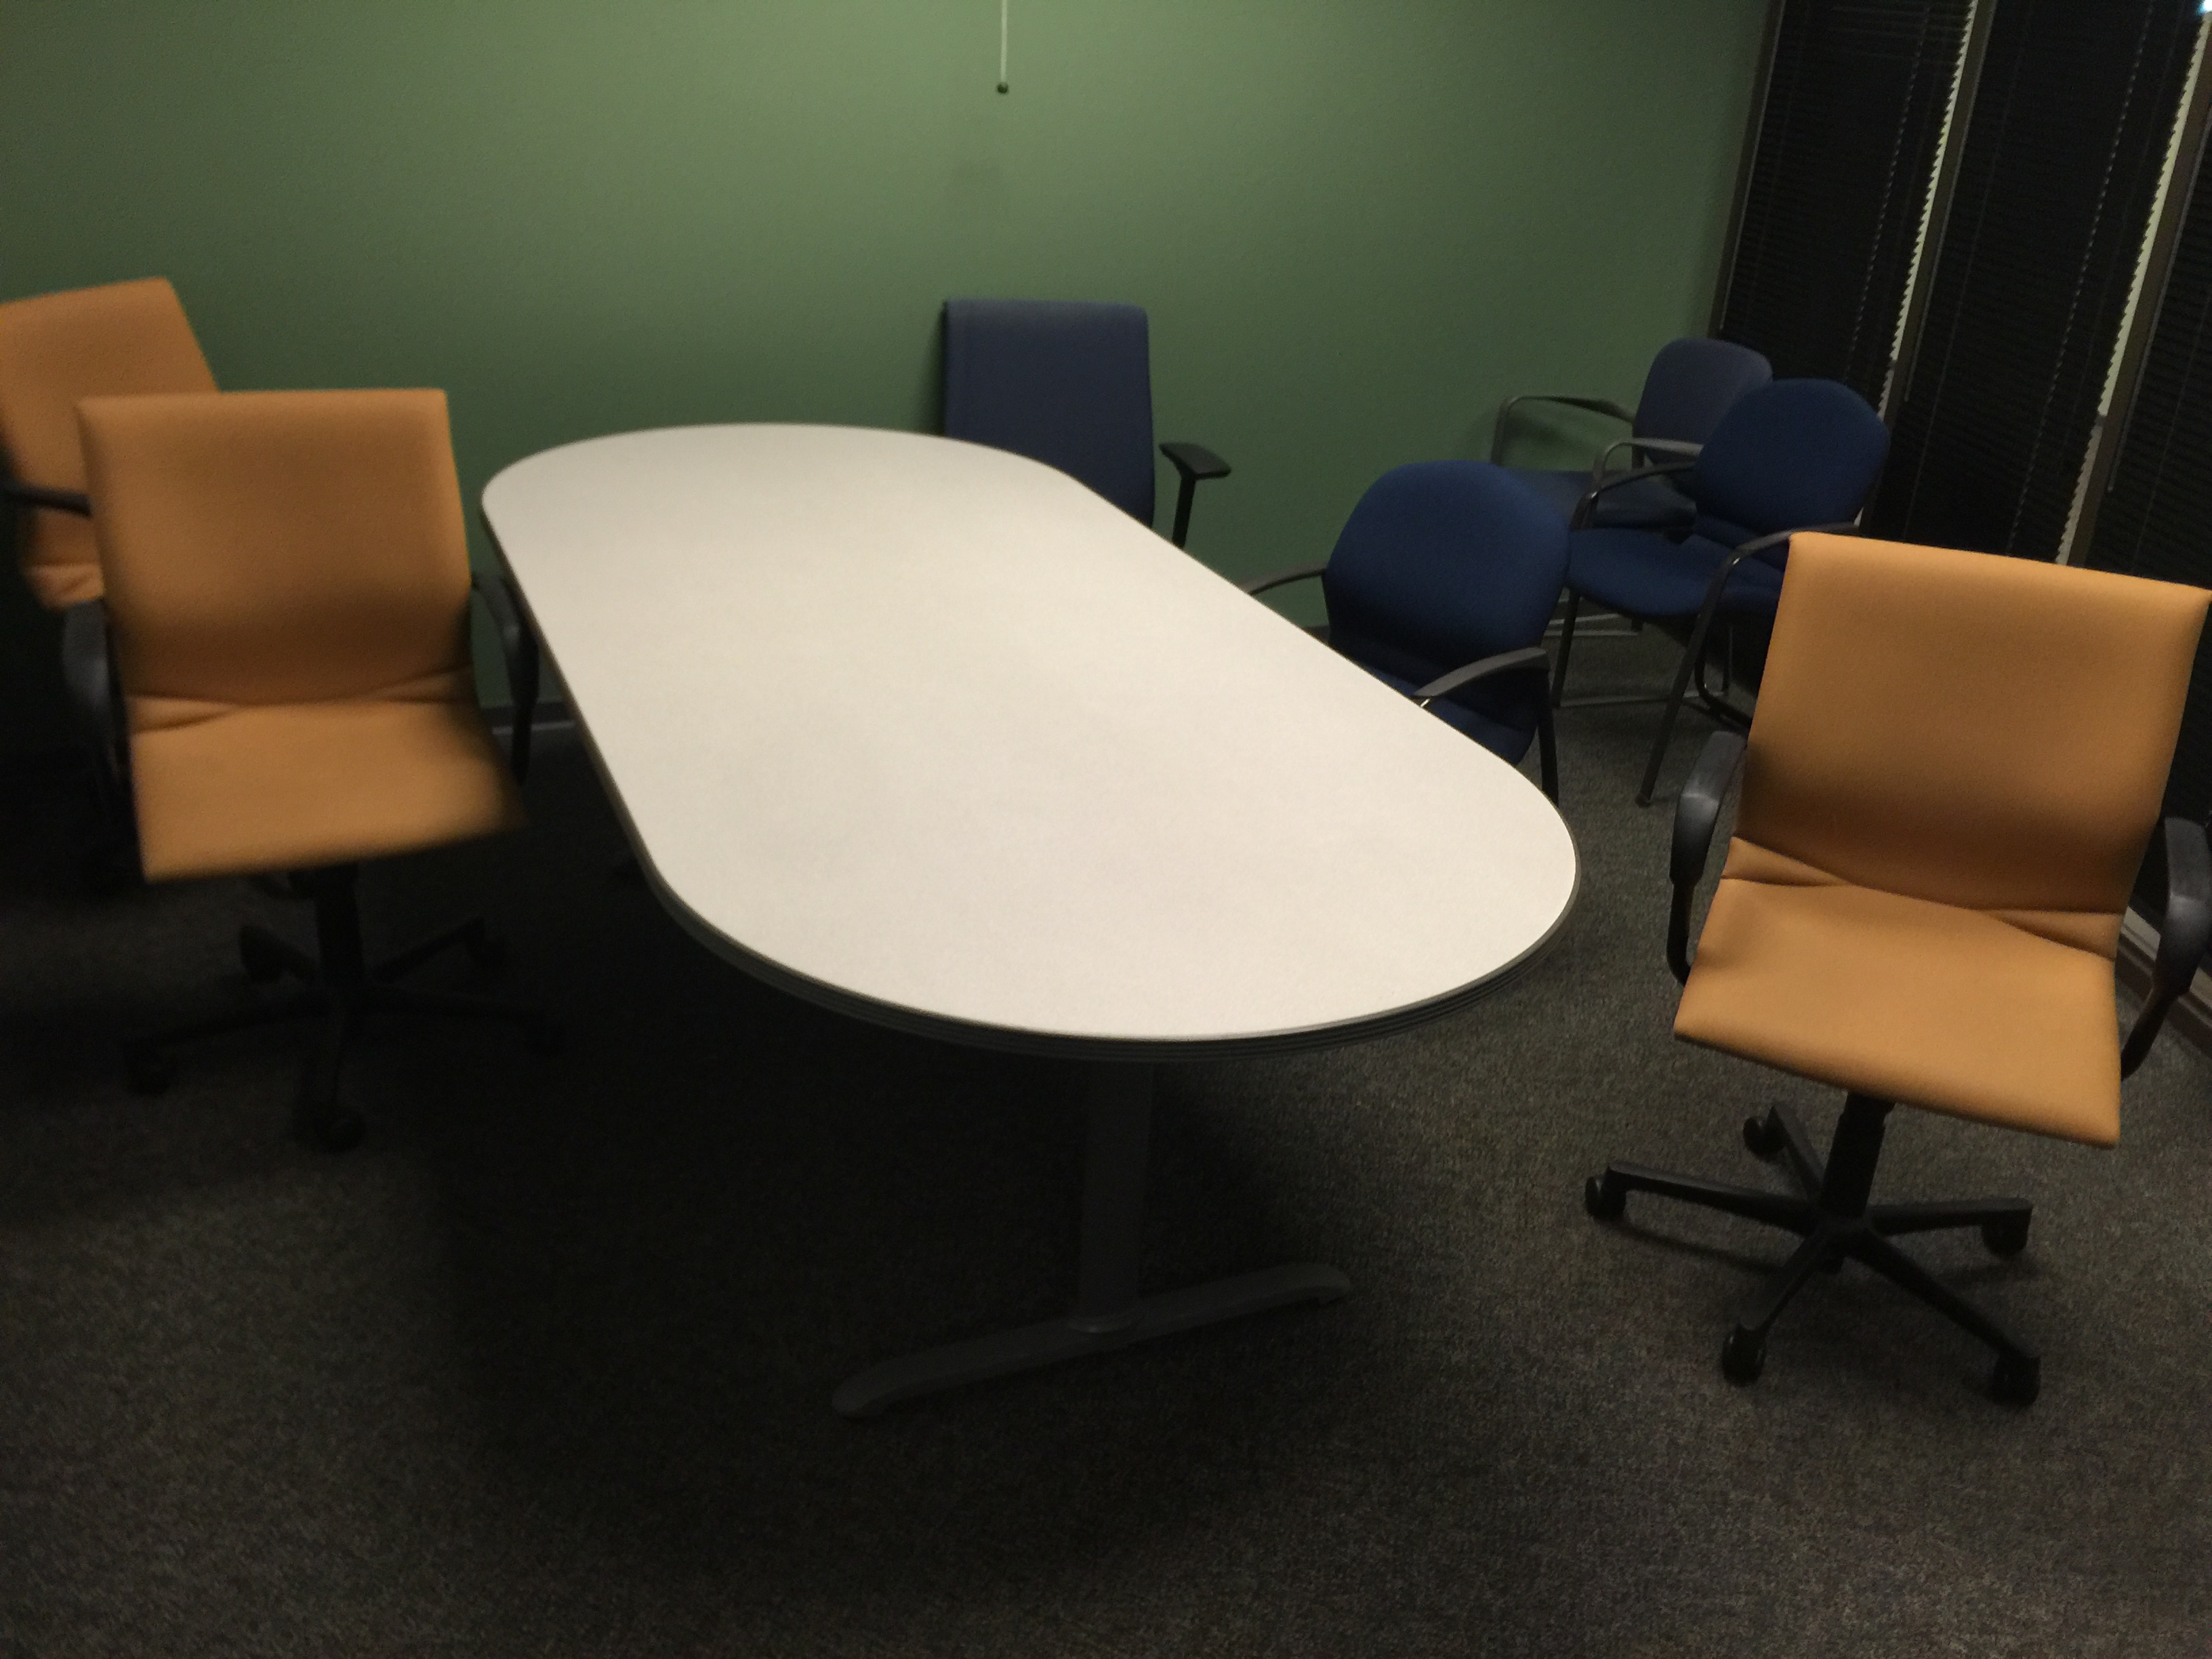 Haworth Conference Tables - Haworth conference table